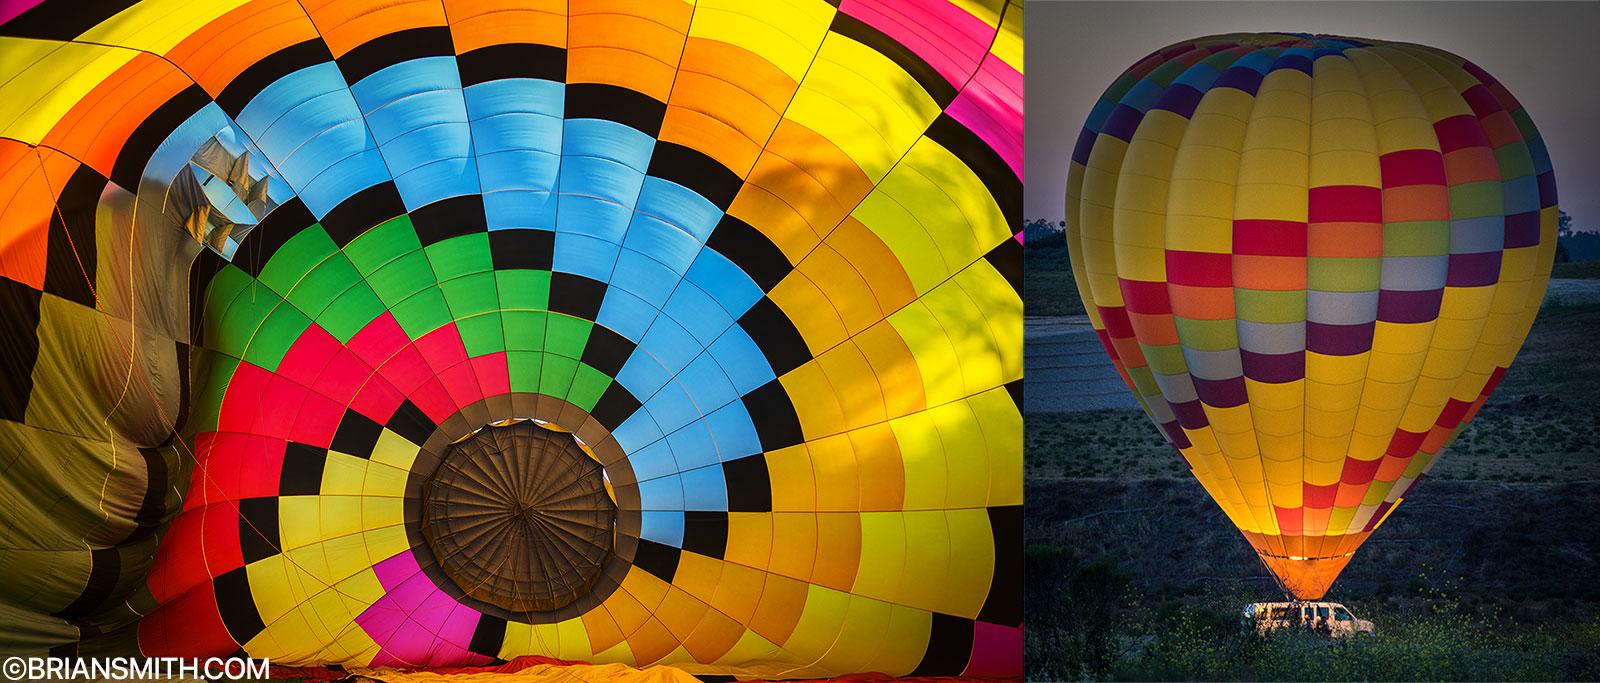 Sony FE 24-240mm lens San Diego balloon